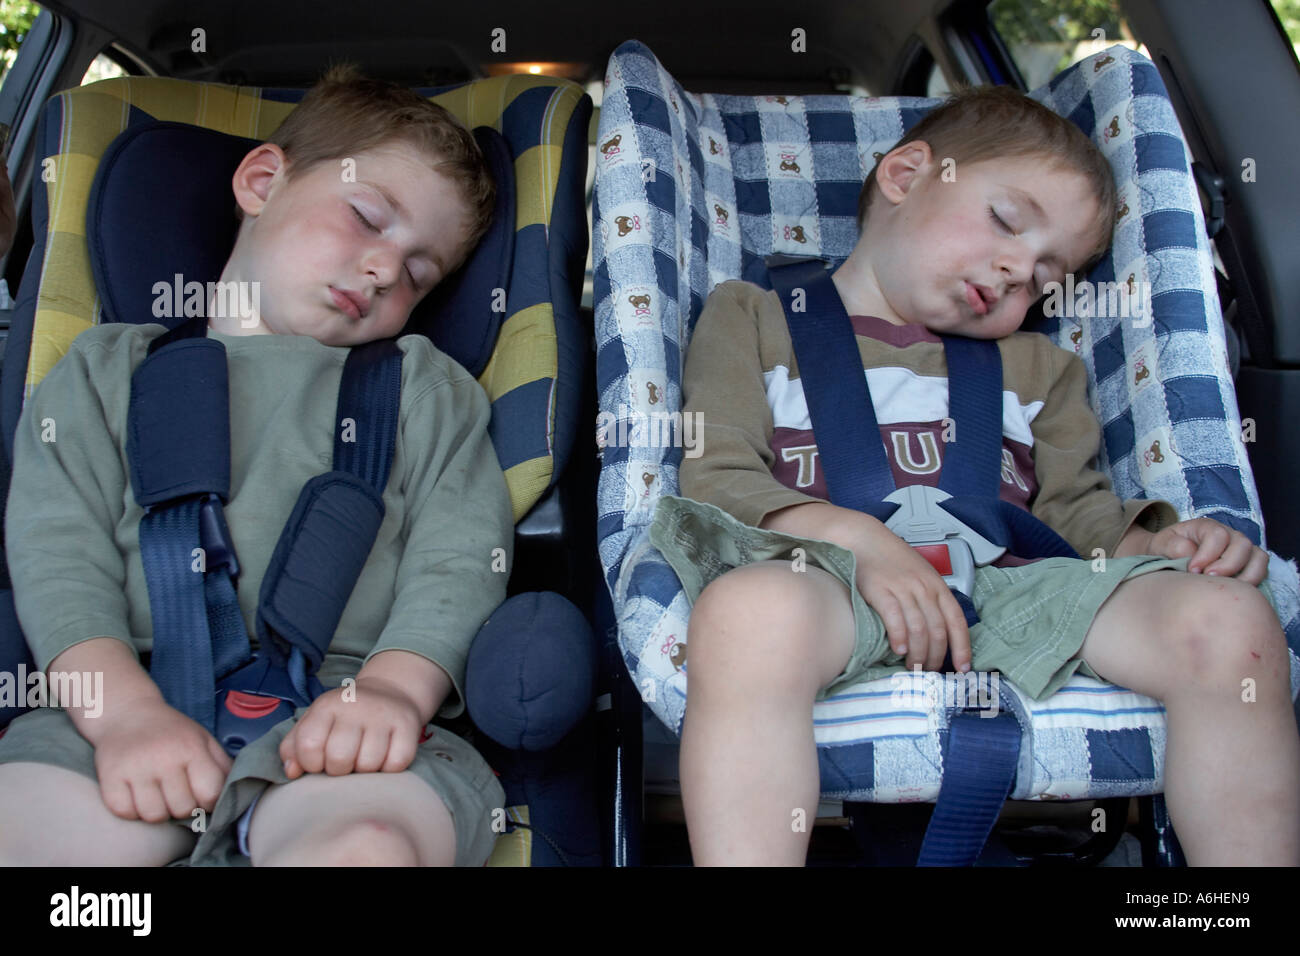 Two Young Boys Asleep Sleeping In Car Seats A CJWH NAOH